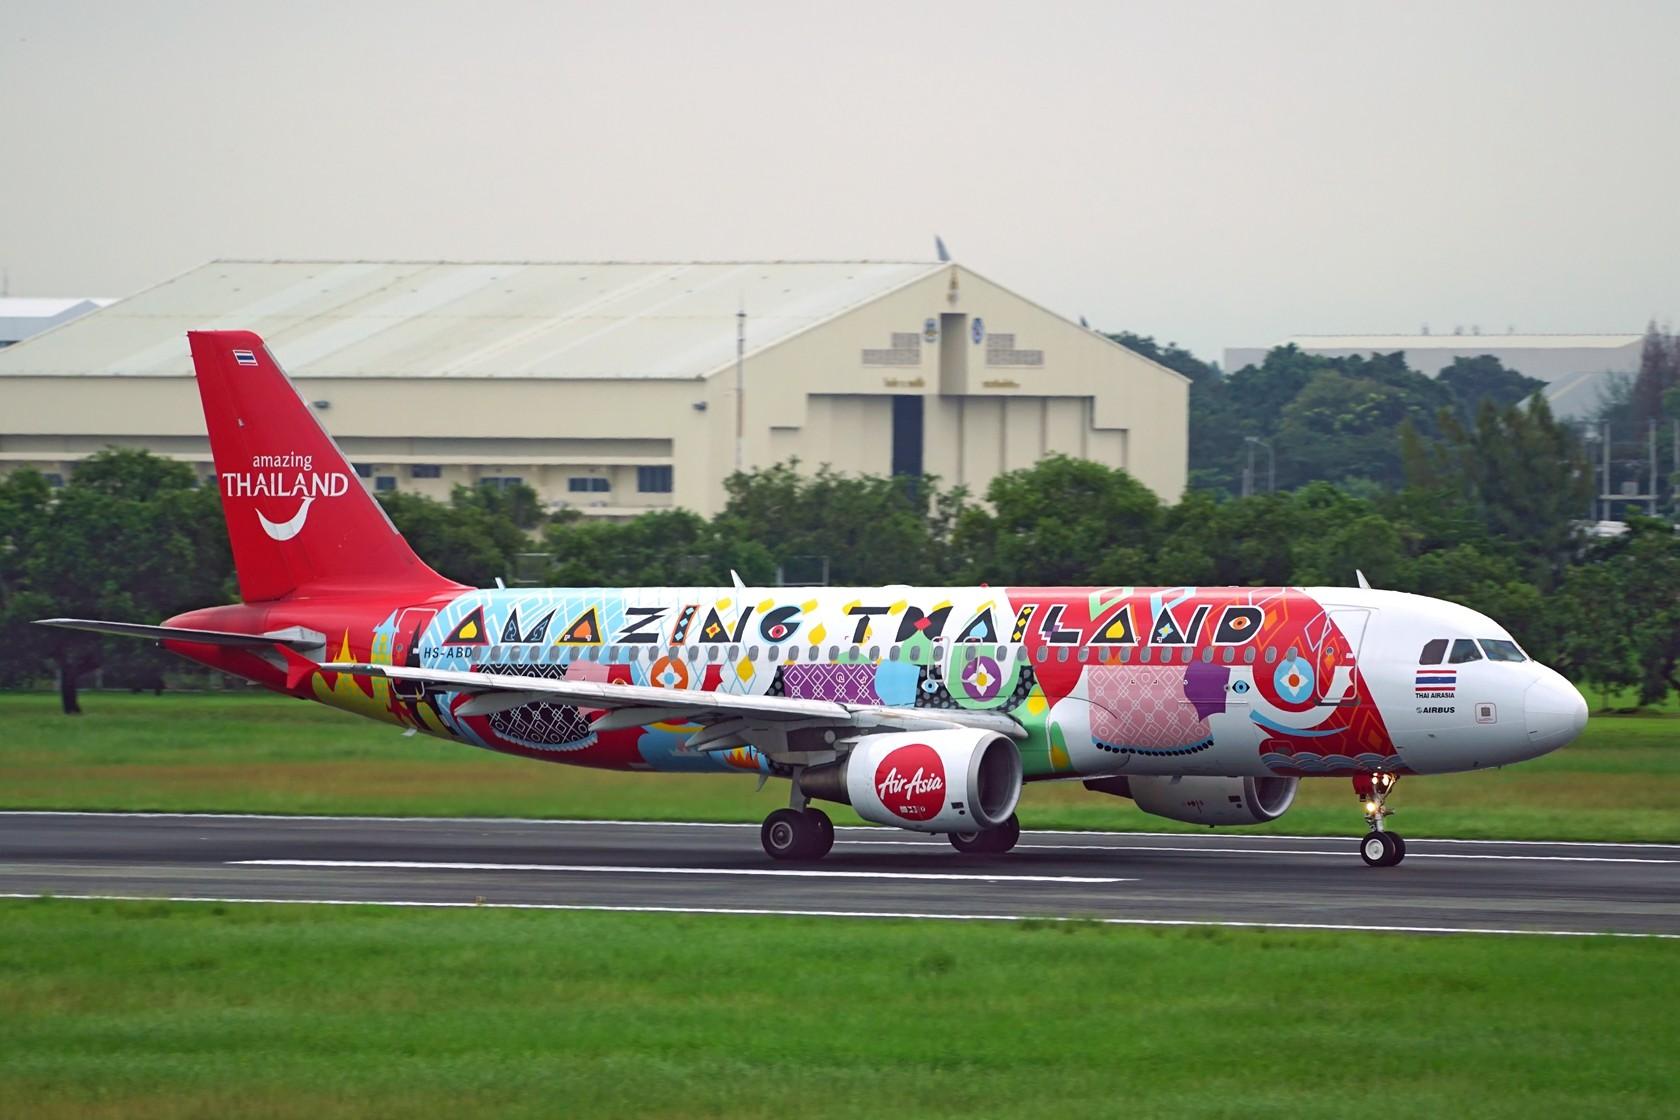 Re:泰国亚洲航空彩绘 门神+缤纷泰国 AIRBUS A320-200 HS-ABD 泰国曼谷廊曼国际机场